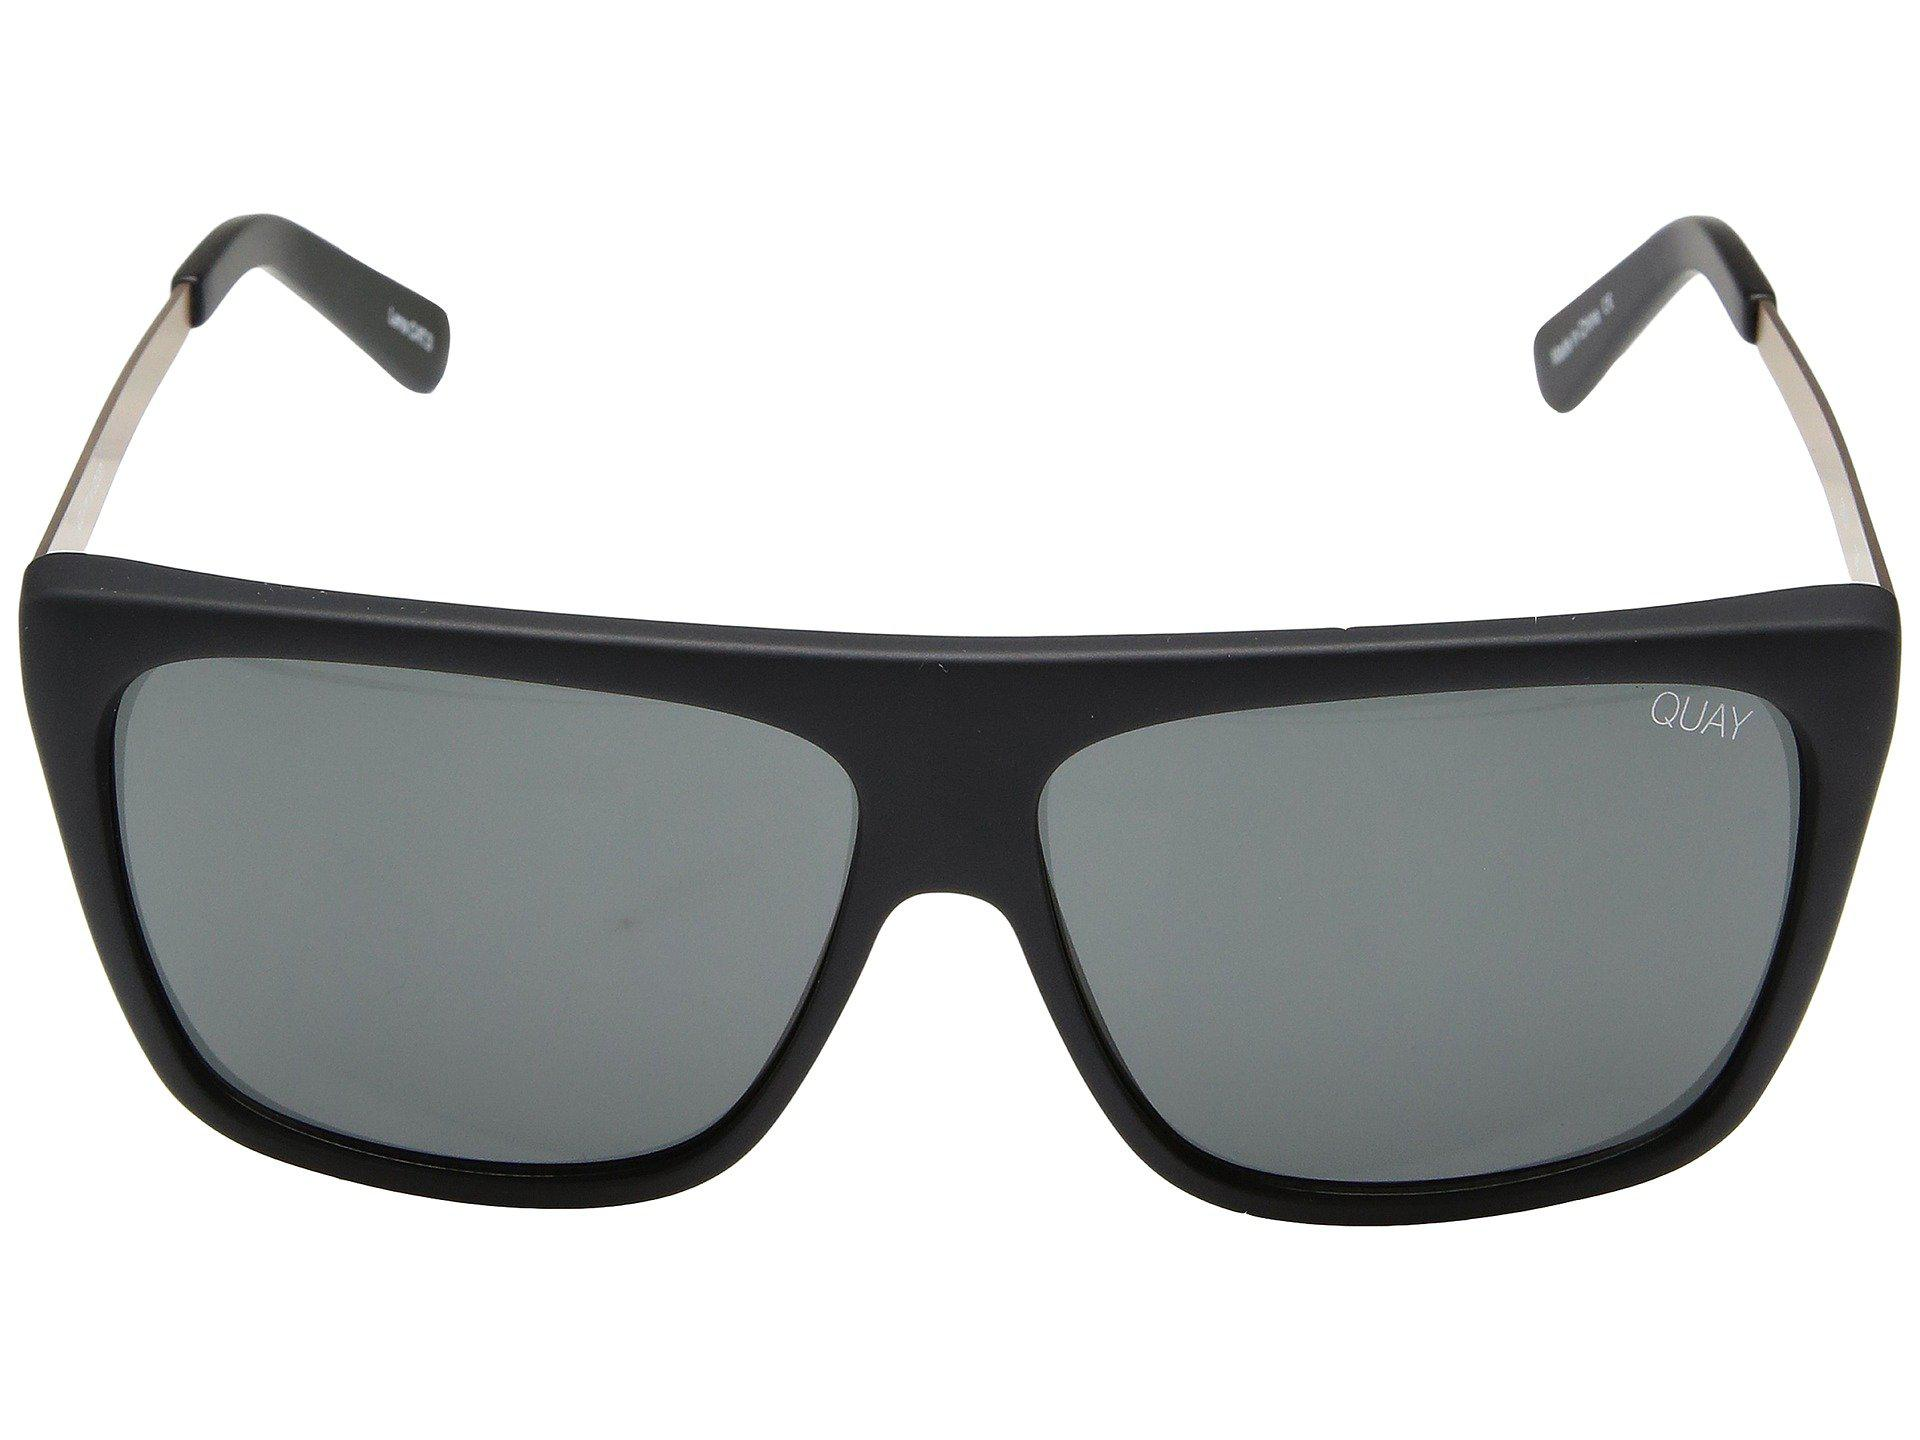 7102ef62d33 Quay - Otl Ii  quayxdesi (black To Tort Fade brown) Fashion Sunglasses.  View fullscreen